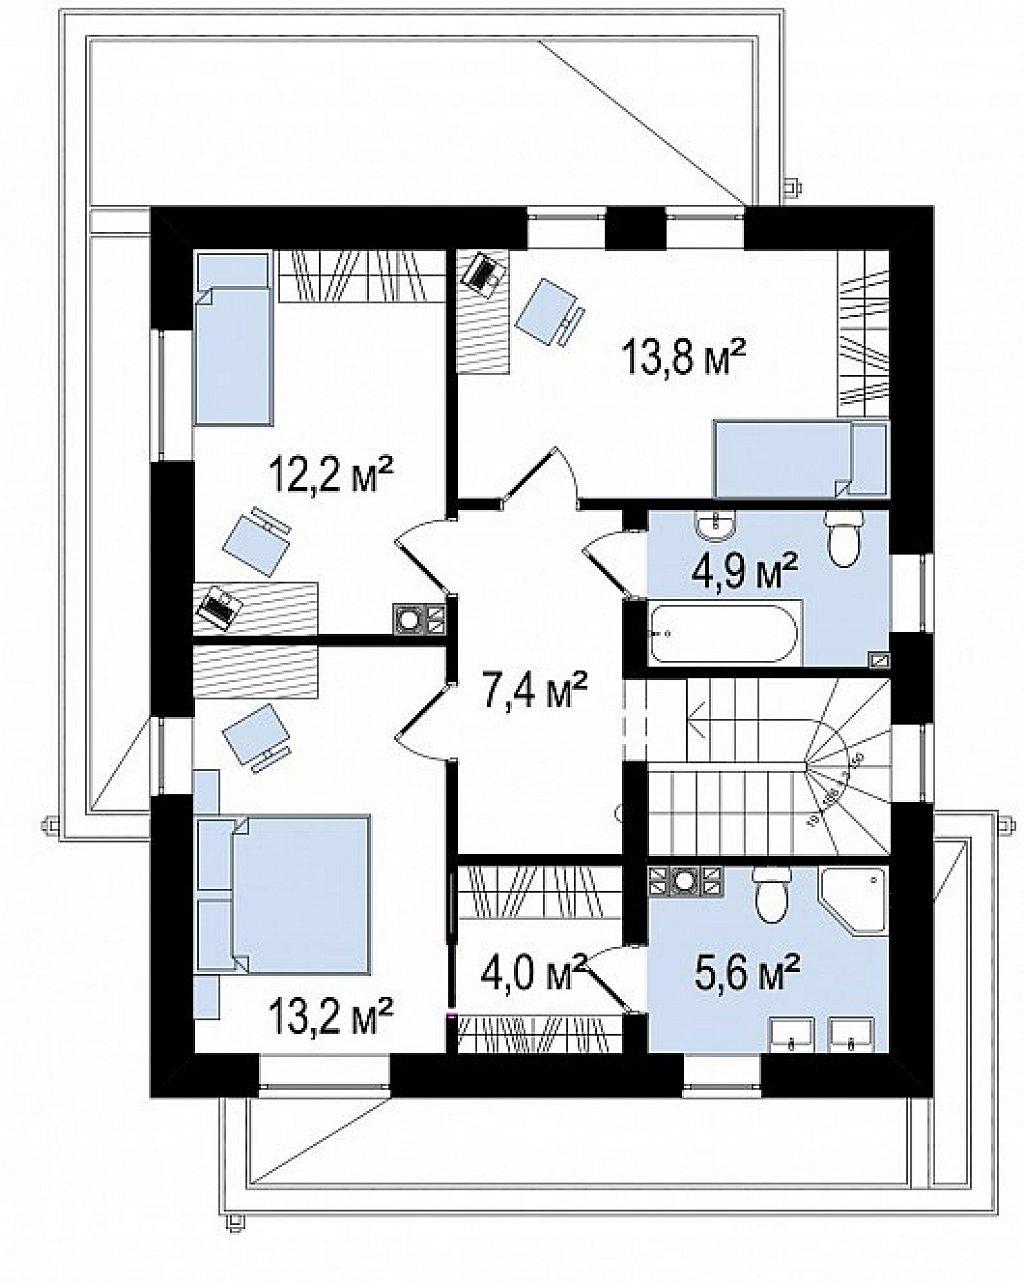 Второй этаж 61,1 м² дома Zx92pk